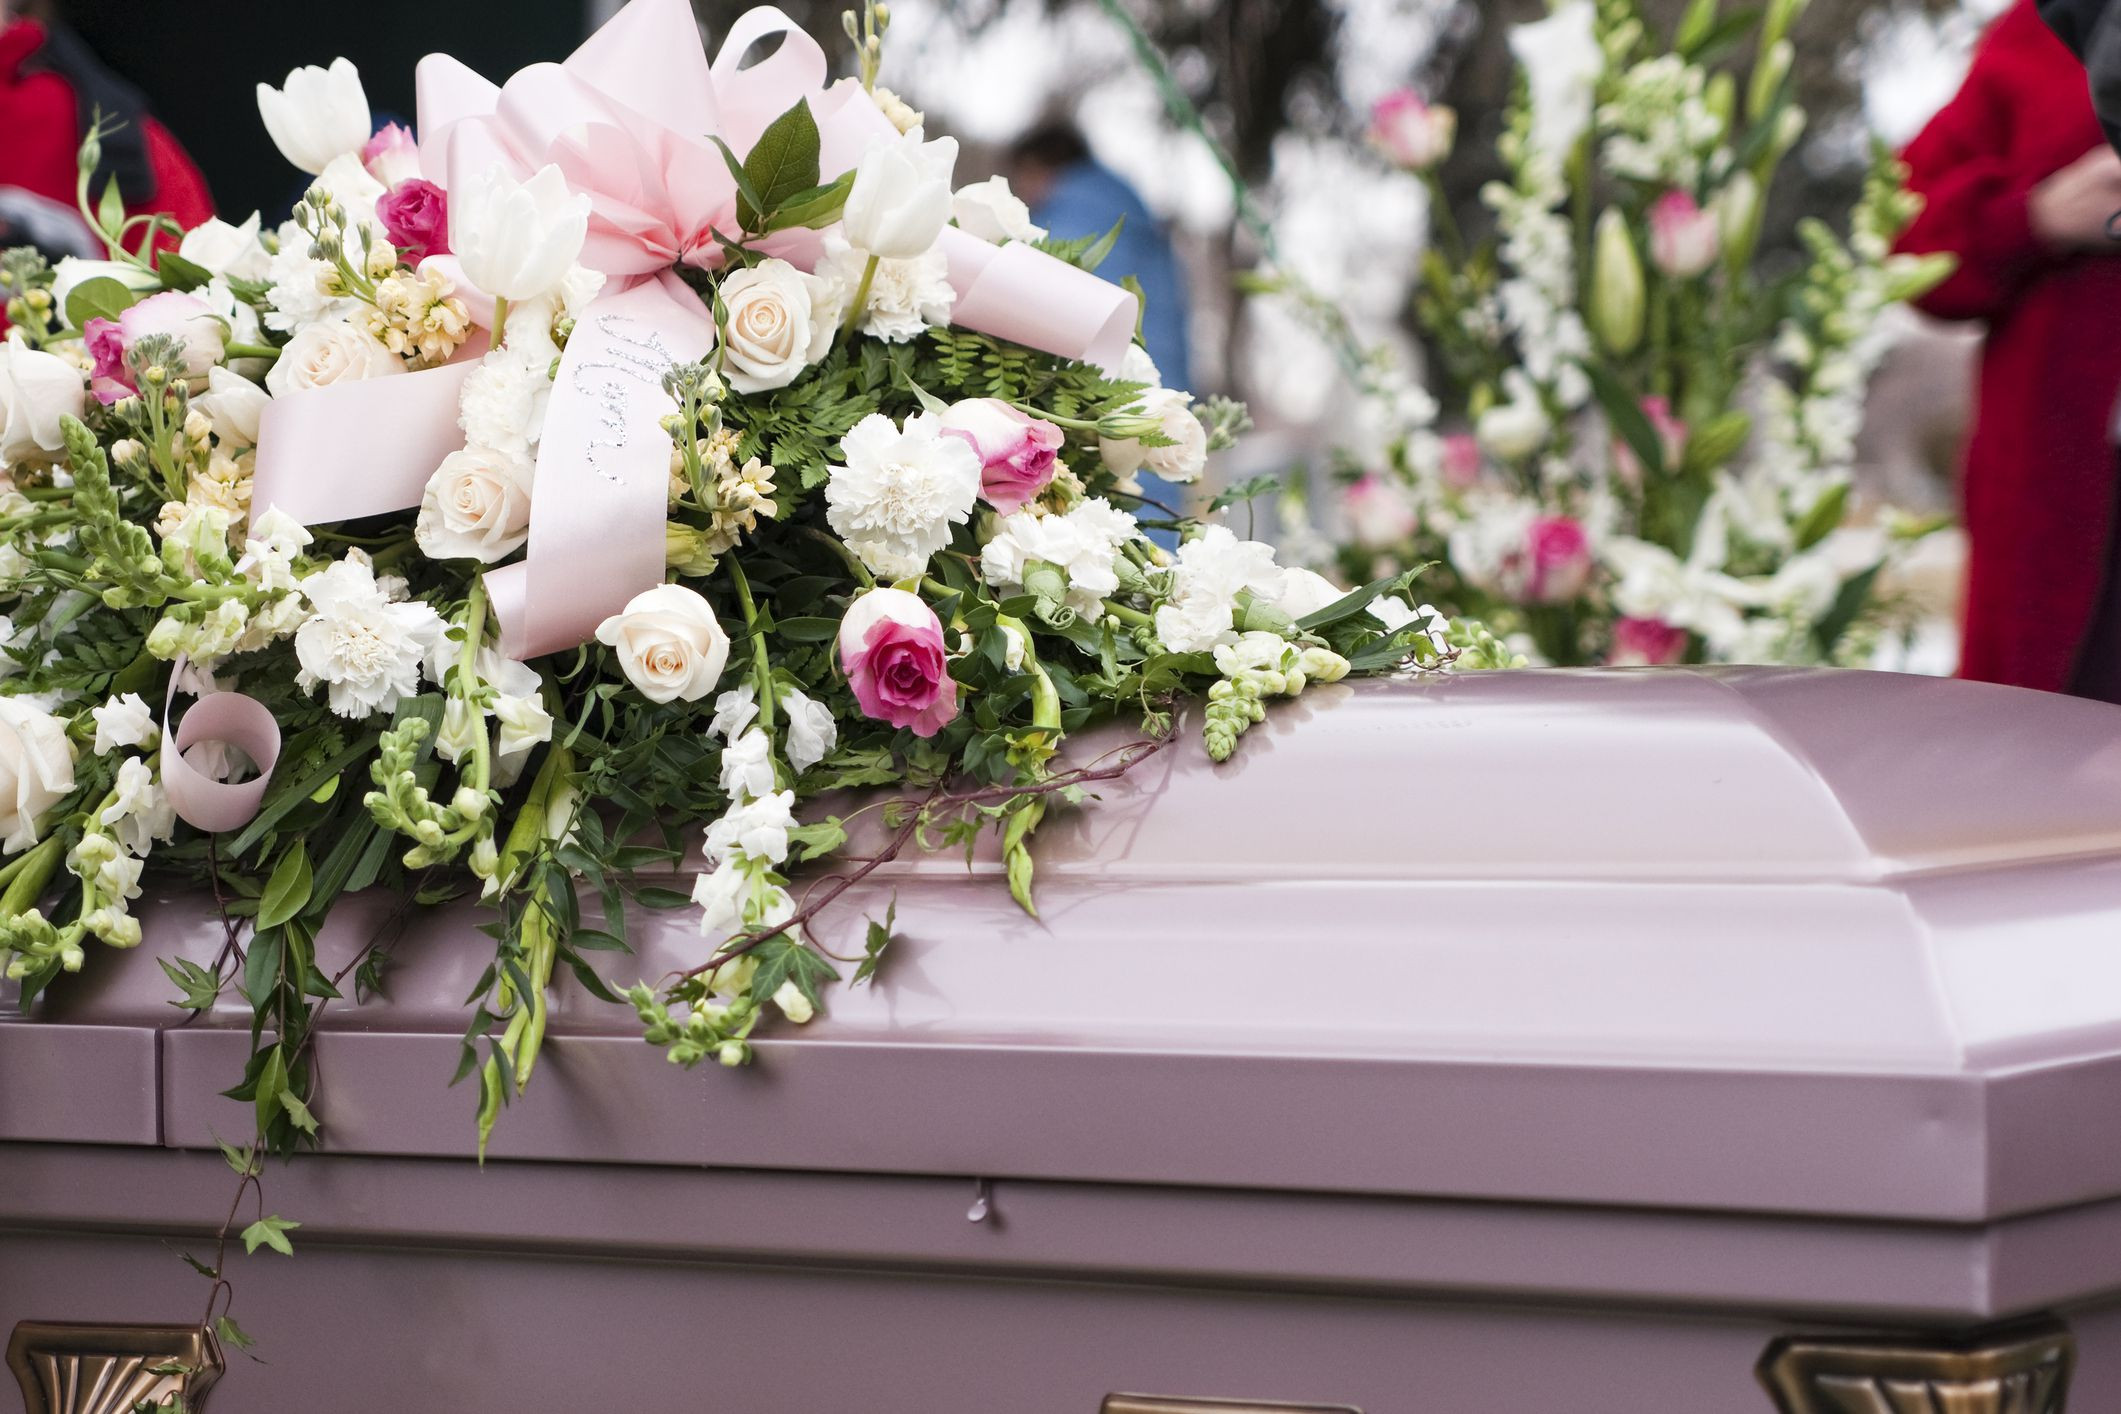 Funeralflowers Getty 5a4878ee89eacc b51fe